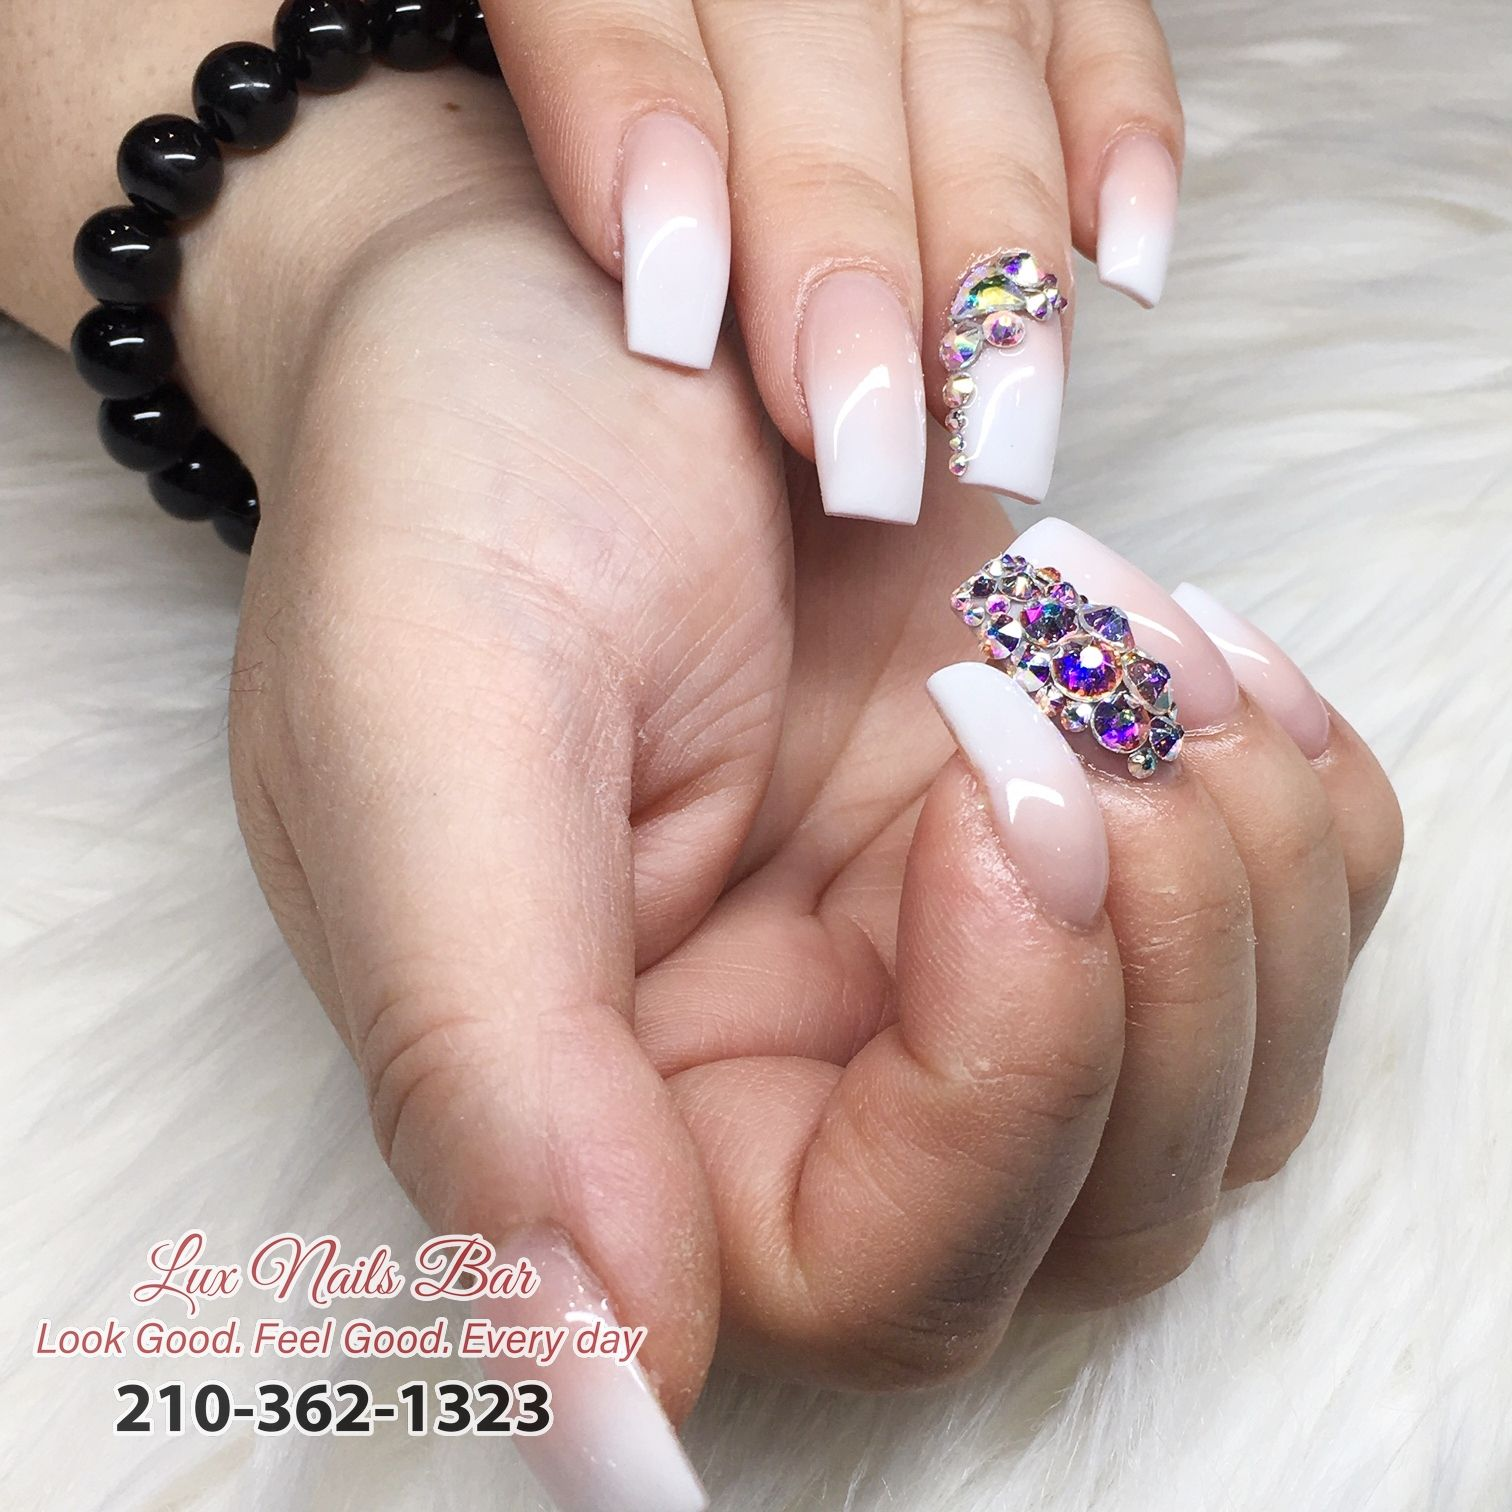 Lux Nails Bar Nails Salon In San Antonio Tx 78230 Lux Nails Manicure Nail Bar